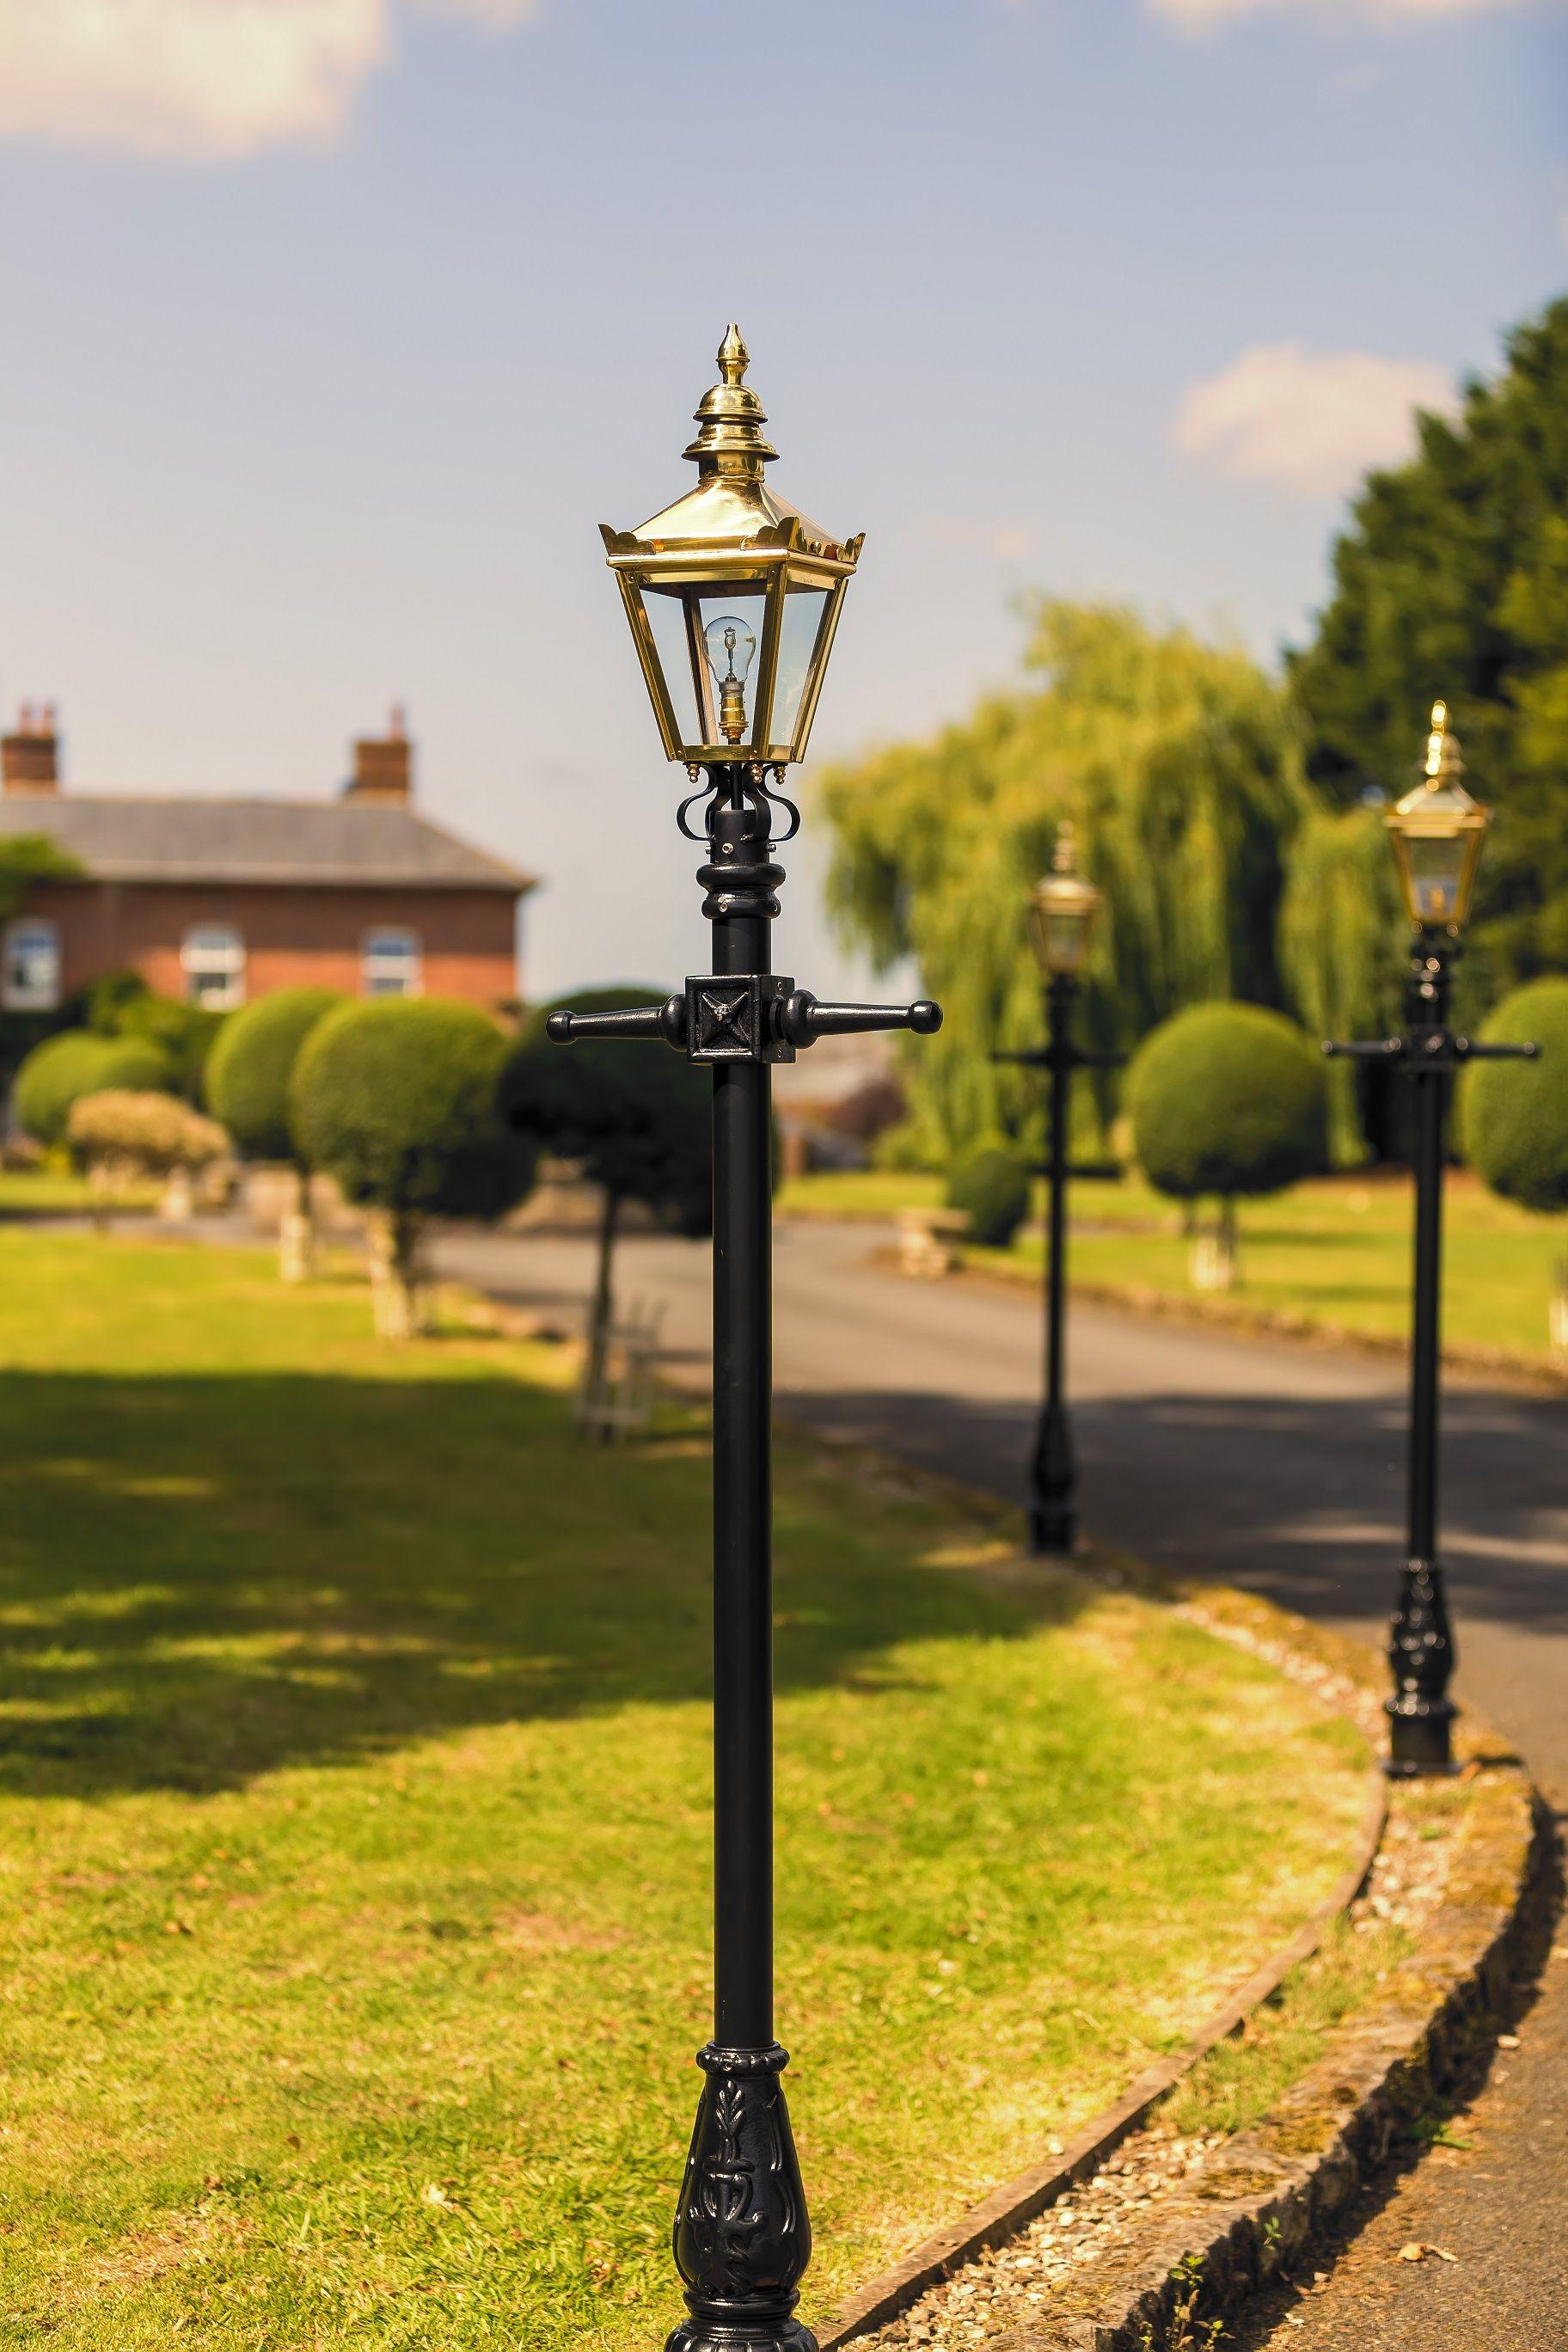 Polished Brass Kensington Lamp Post 2 25m Lamp Post Victorian Lamps Iron Lamp Post